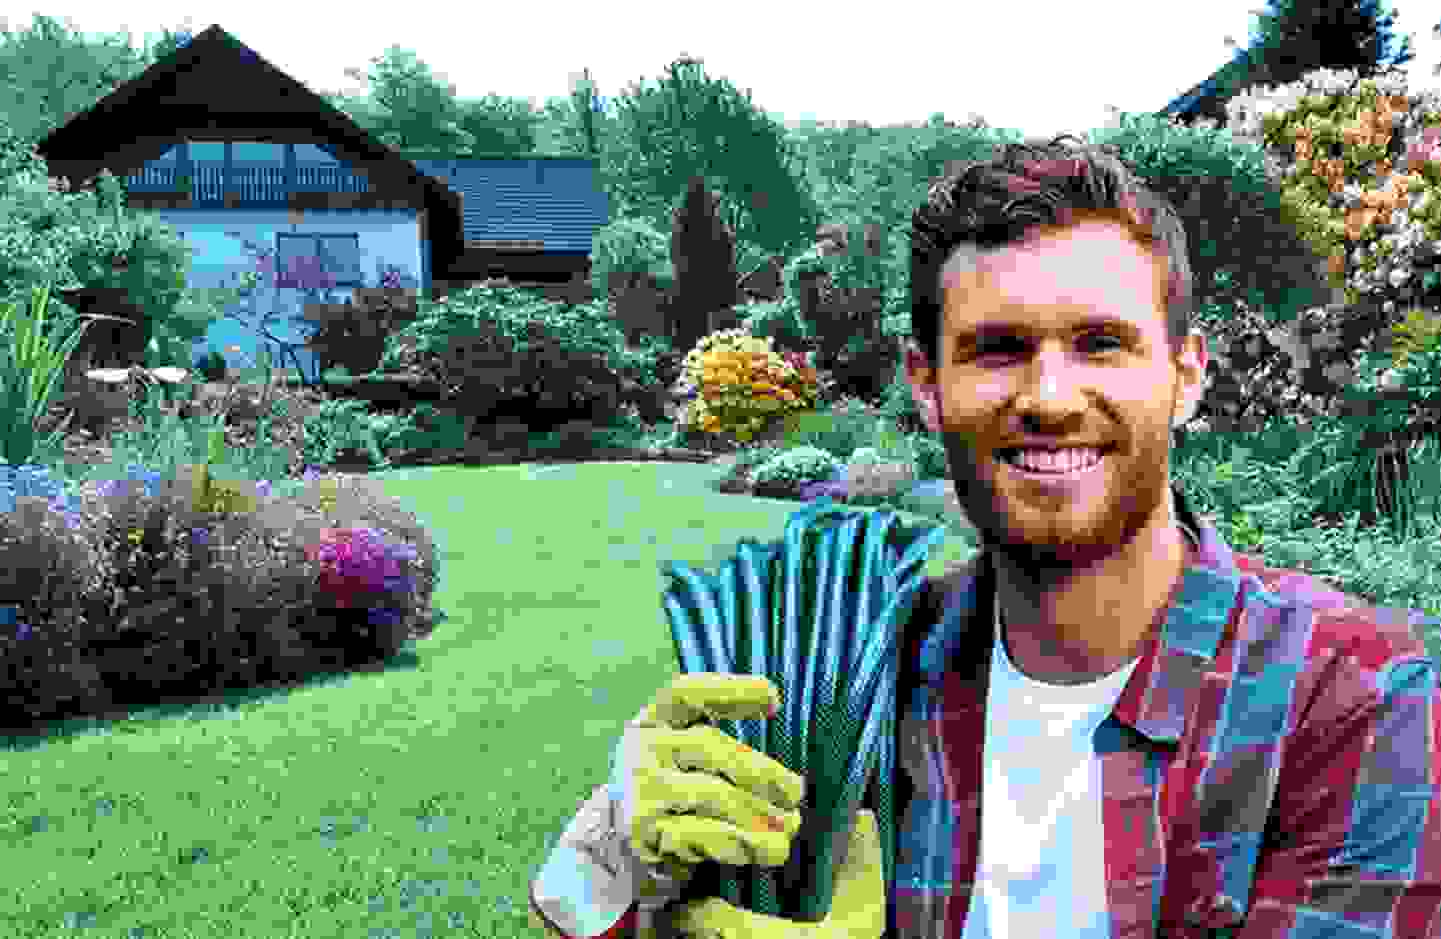 Projets de jardinage avec Toolcraft »